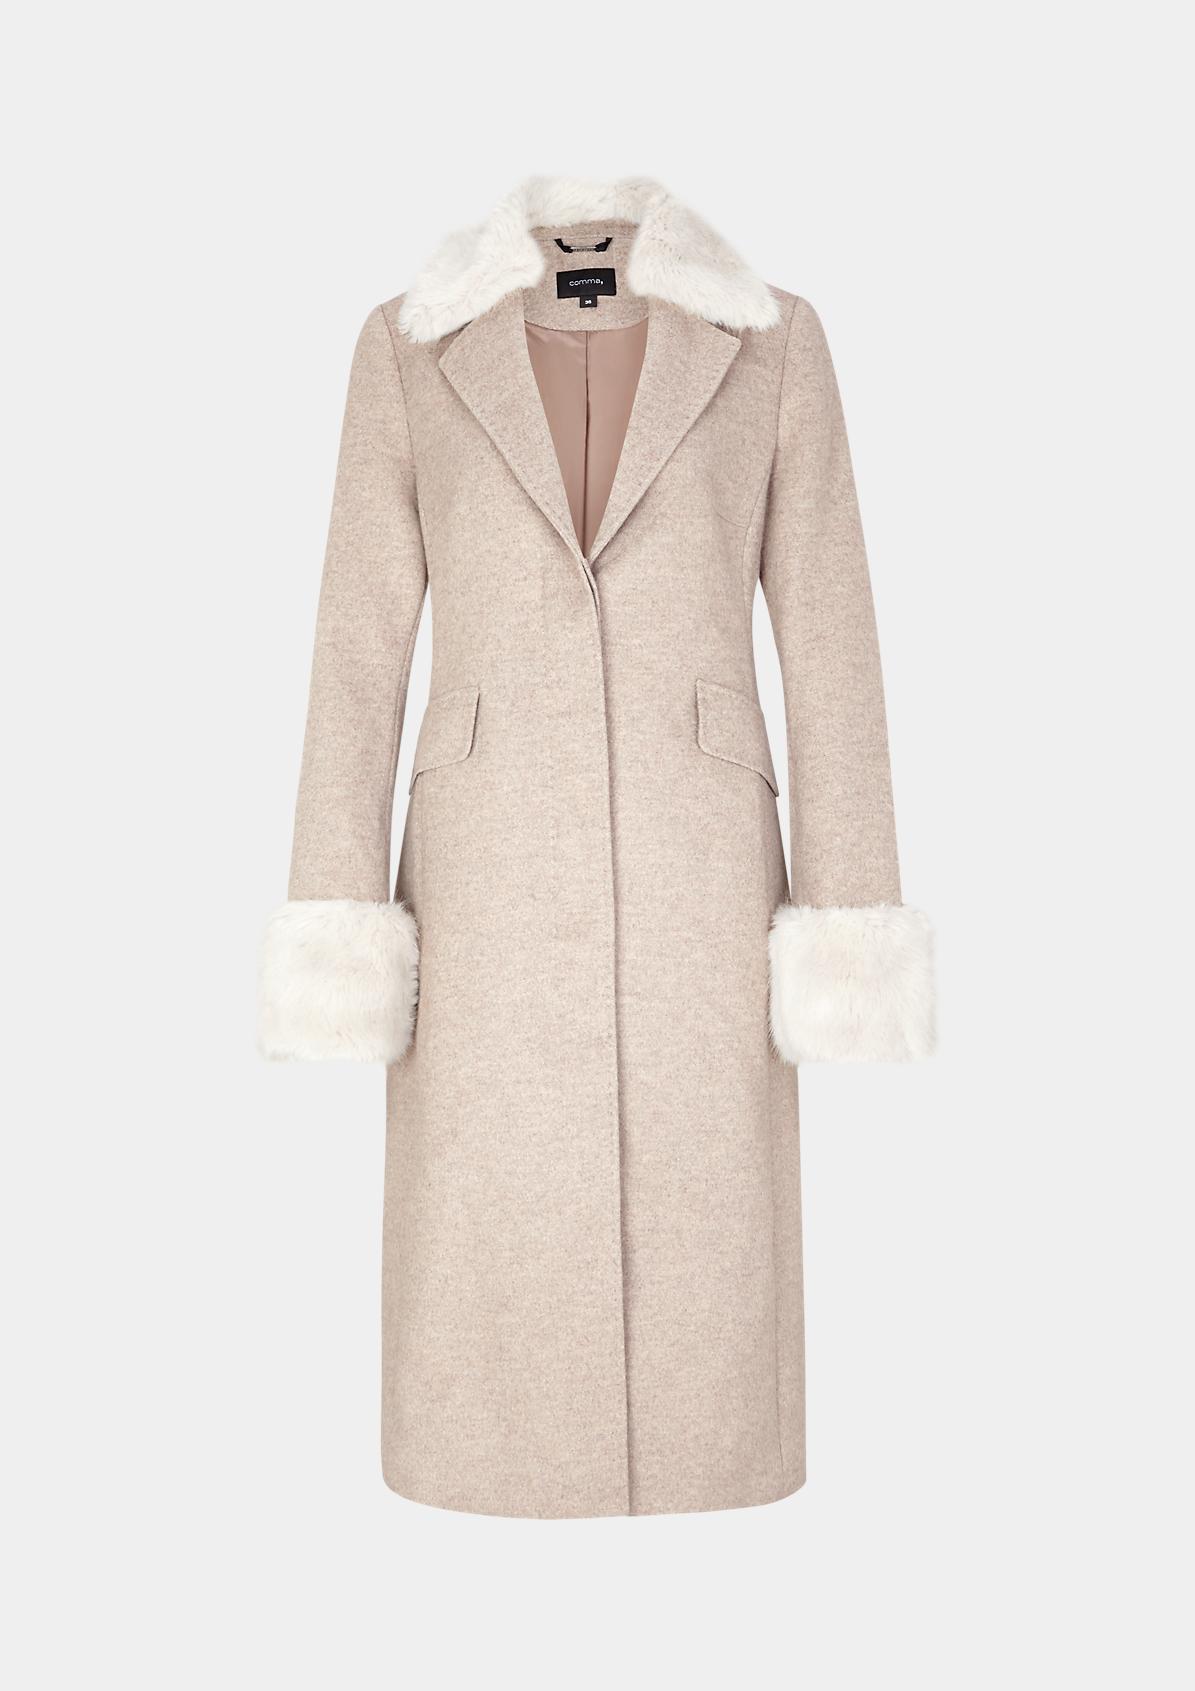 Wintermantel mit Fake-Fur Besatz